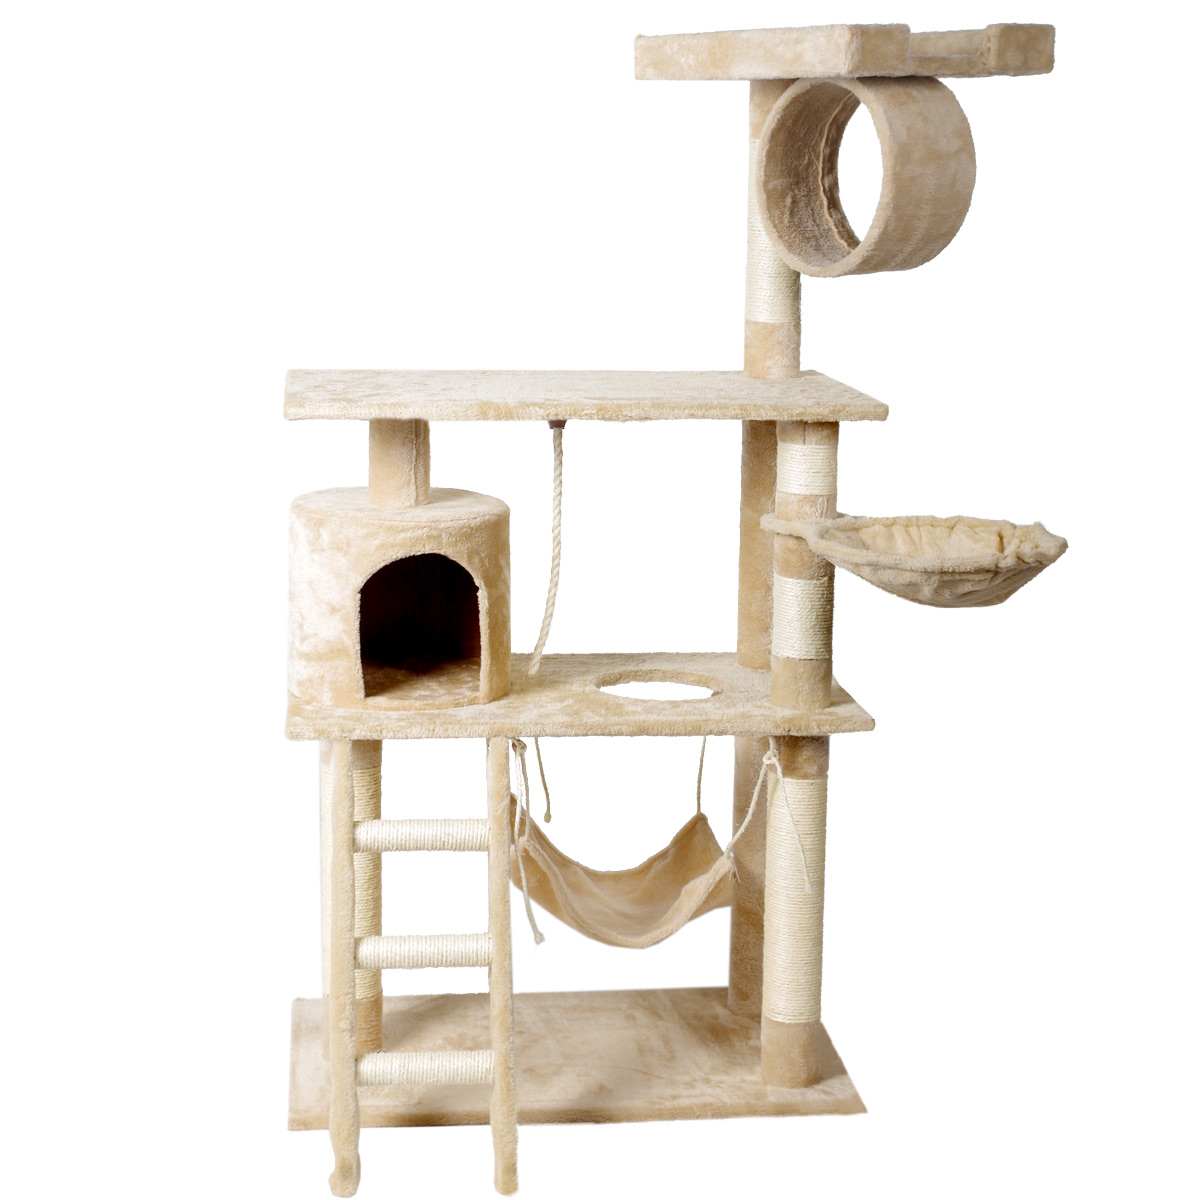 kratzbaum katzenkratzbaum kletterbaum f r katzen 138cm h he katzenbaum sisal ebay. Black Bedroom Furniture Sets. Home Design Ideas